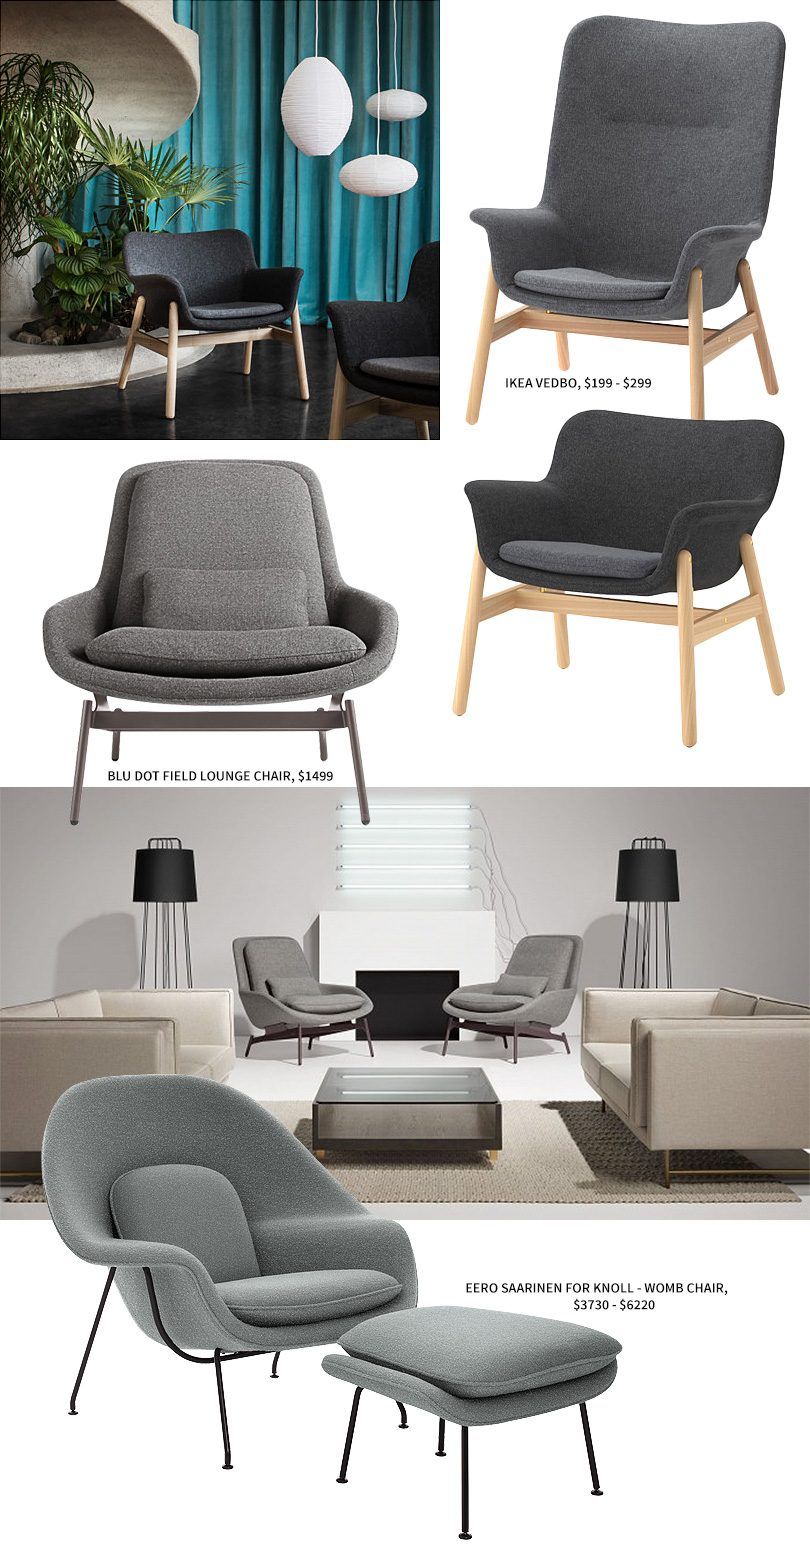 IKEA VEDBO vs. Blu Dot FIeld Lounge Chair vs. Eero Saarinen Womb Chair